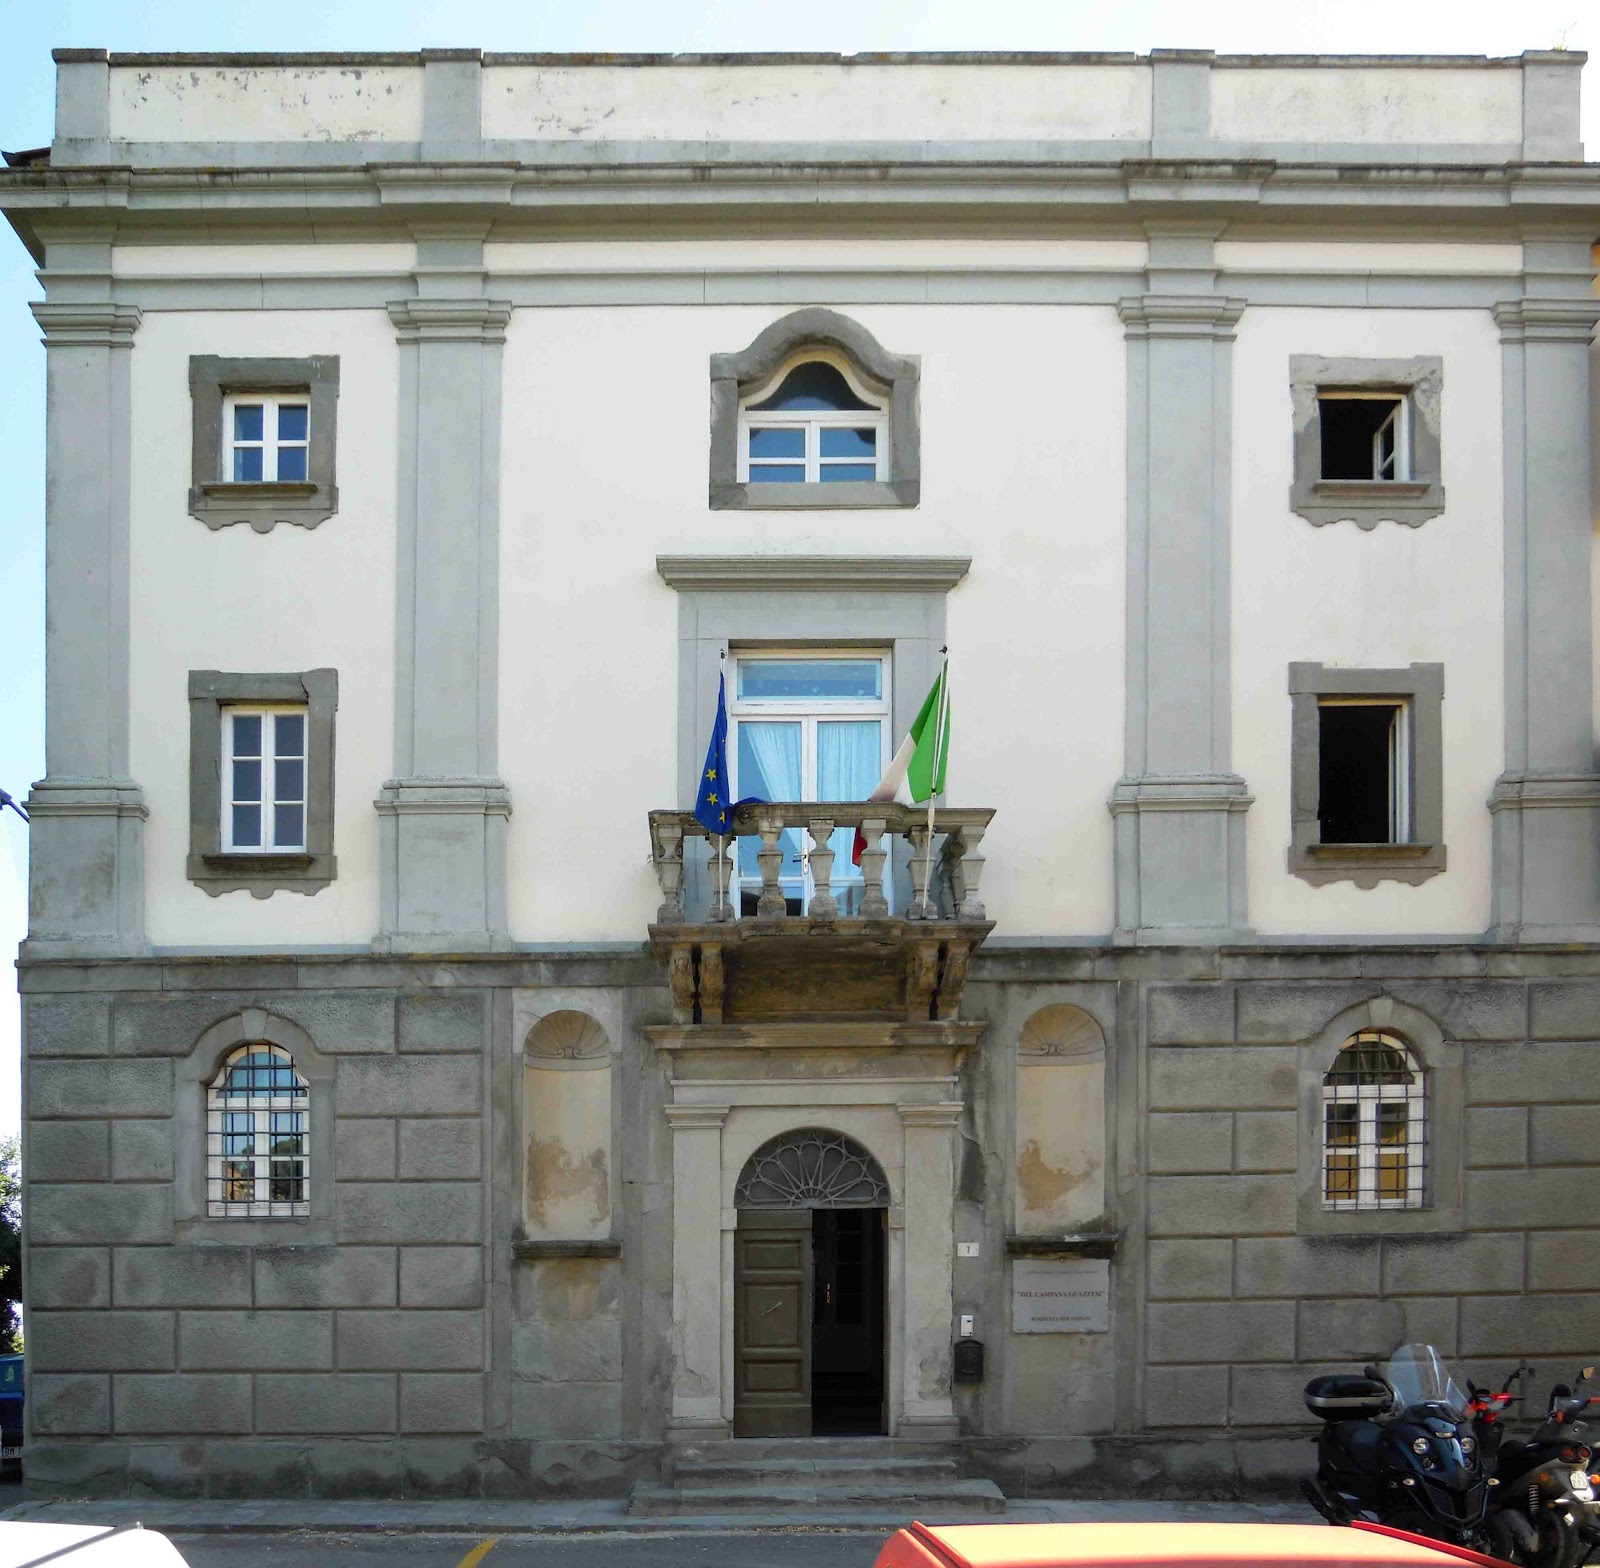 Casa Di Cura Villa Pia Via Bernardino Ramazzini Roma Rm